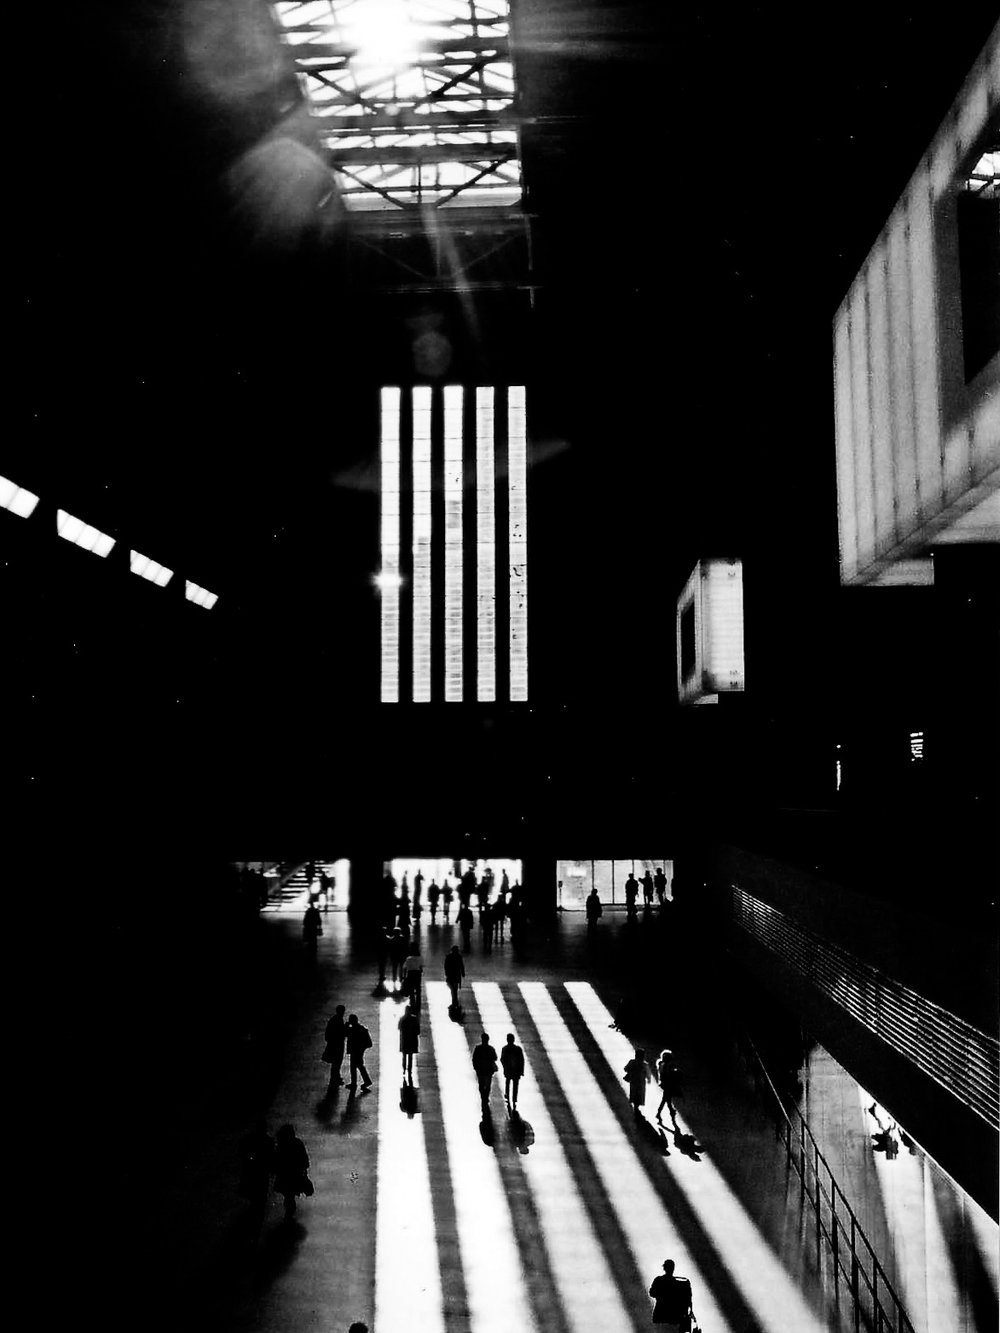 Minolta Vectis S-1 APS Advanced Photo System Advantix Film Camera Review 1996 Tate Modern